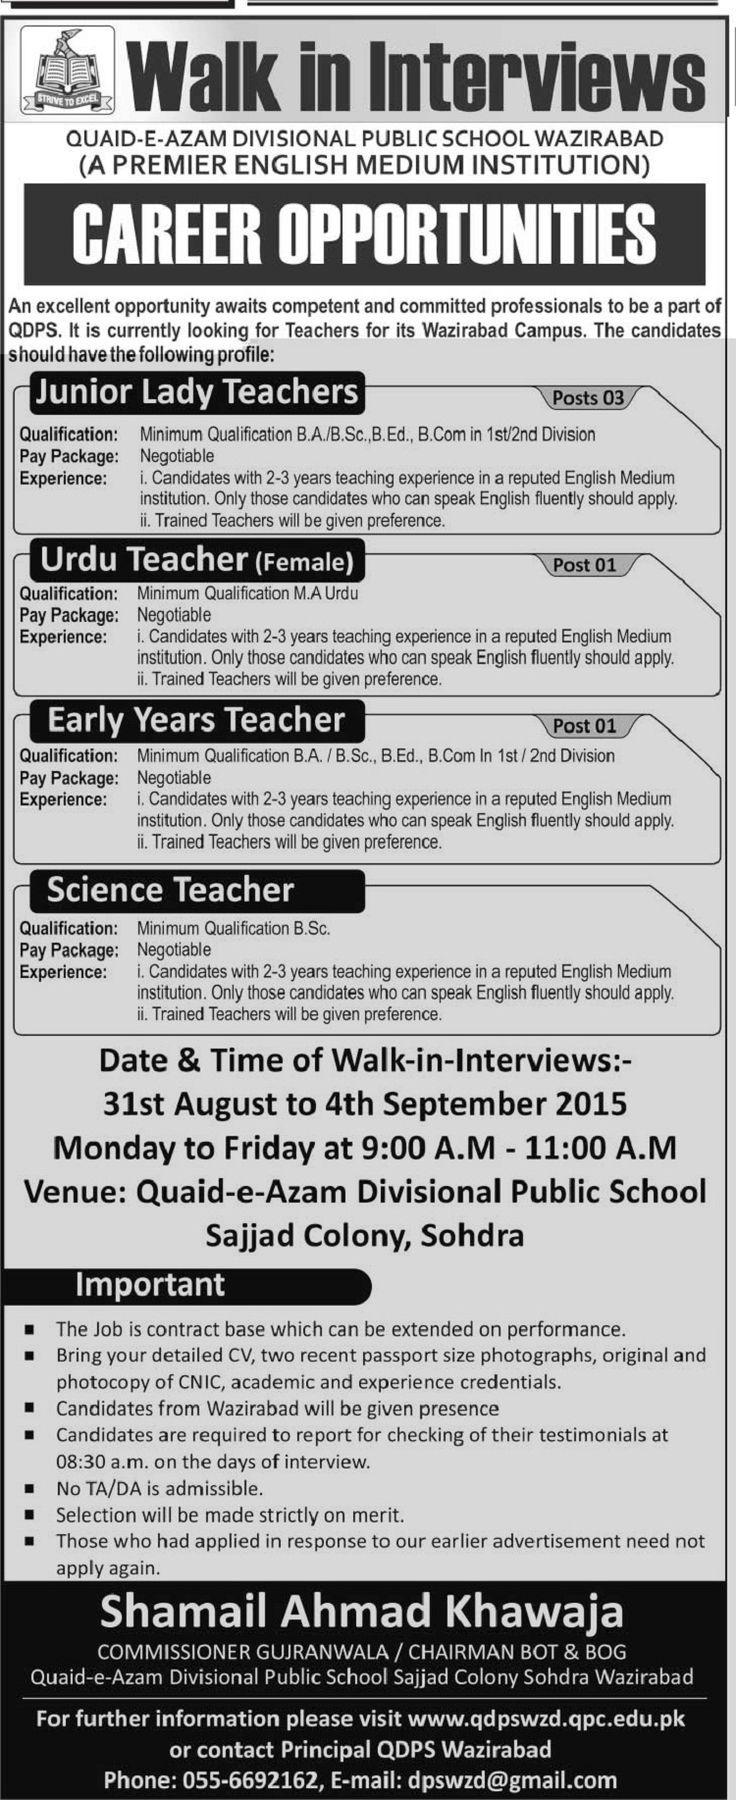 Teachers Jobs in QDPS-Quaid E Azam Divisional Public School Wazirabad, Teachers,Lecturers,Urdu Teacher, English Teacher, Math Teacher Jobs, Clerks, Operator